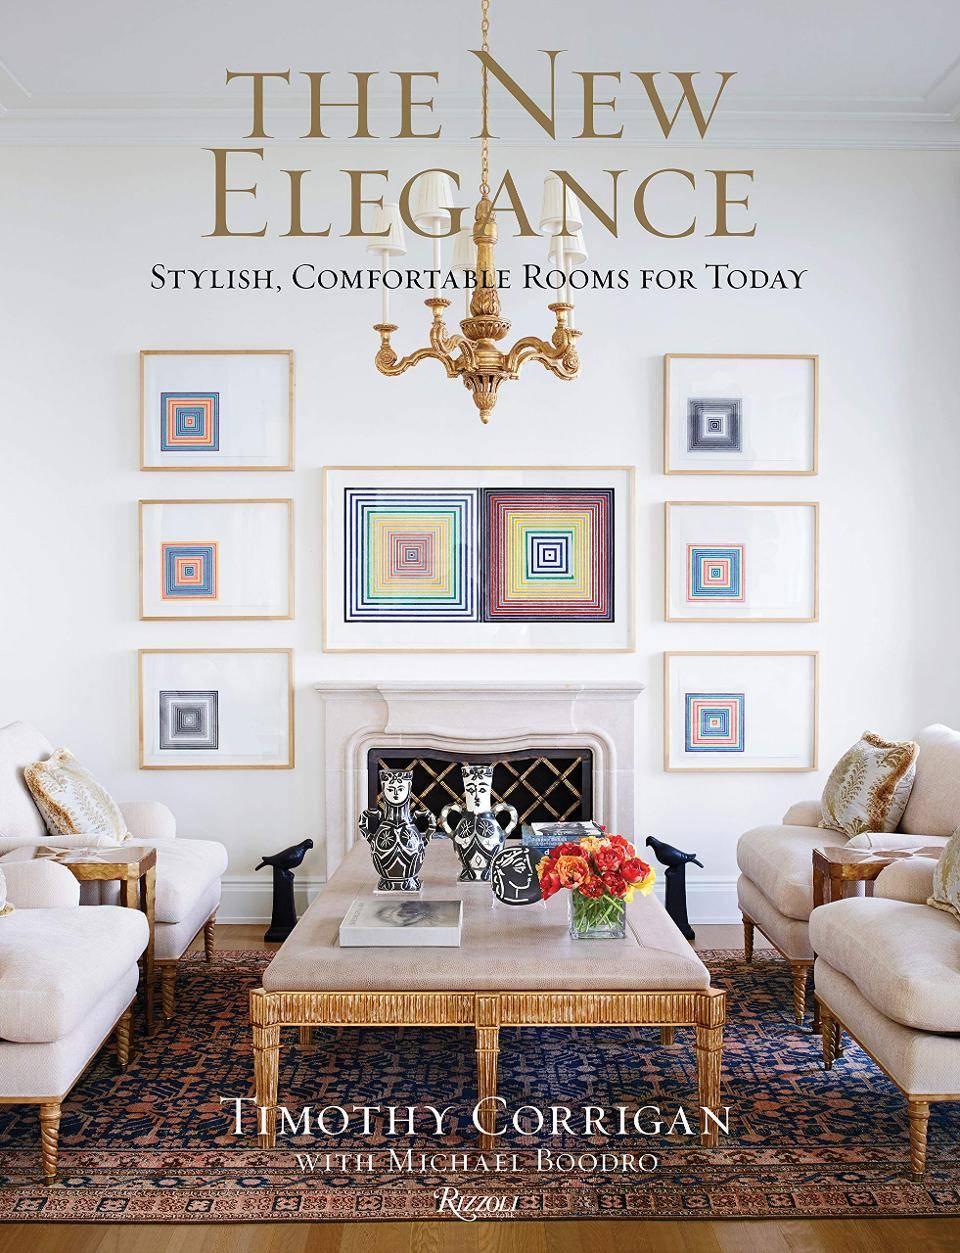 The New Elegance